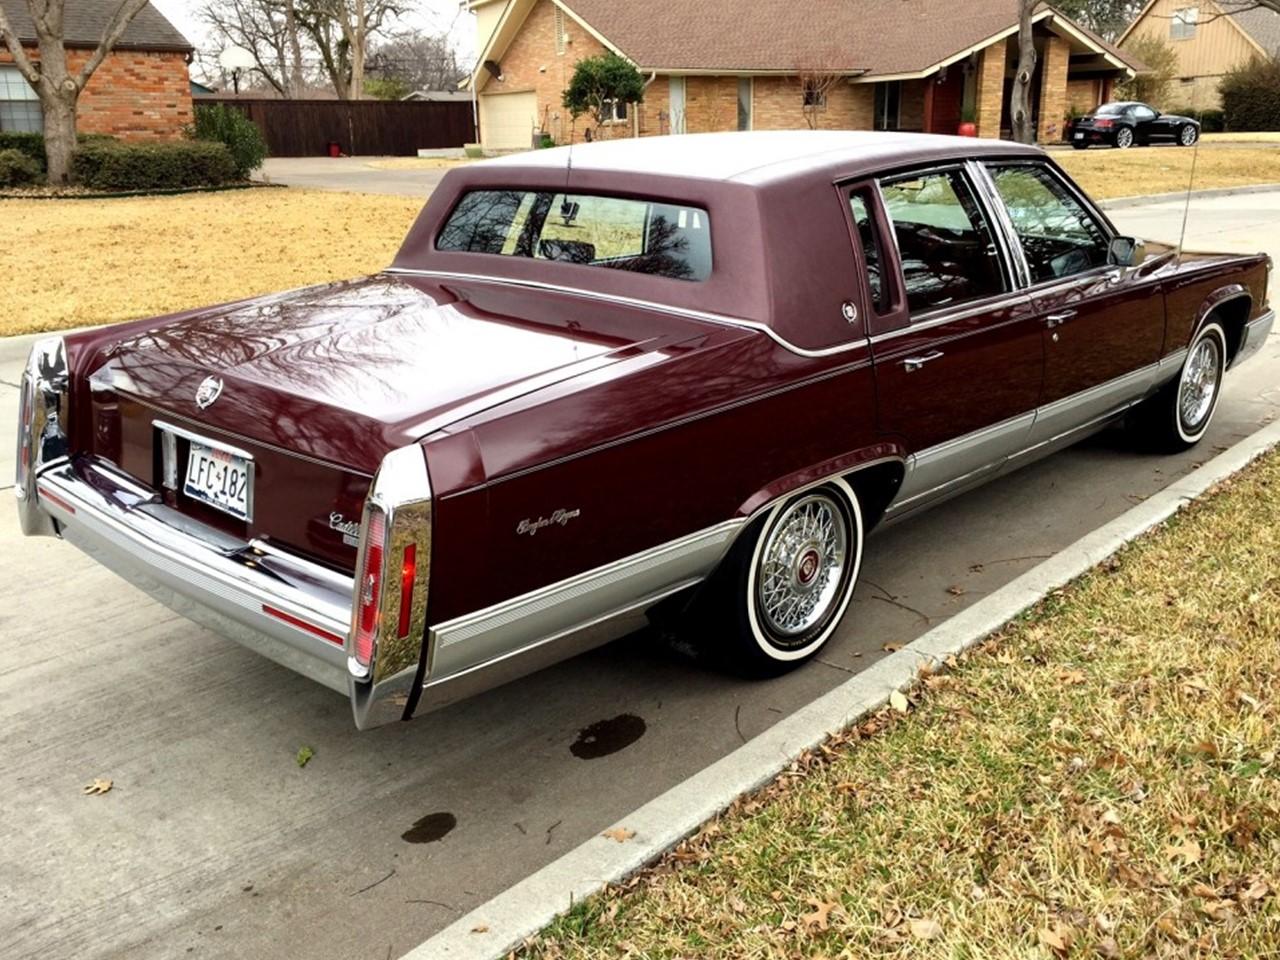 1991 Cadillac Brougham d'Elegance | NotoriousLuxury